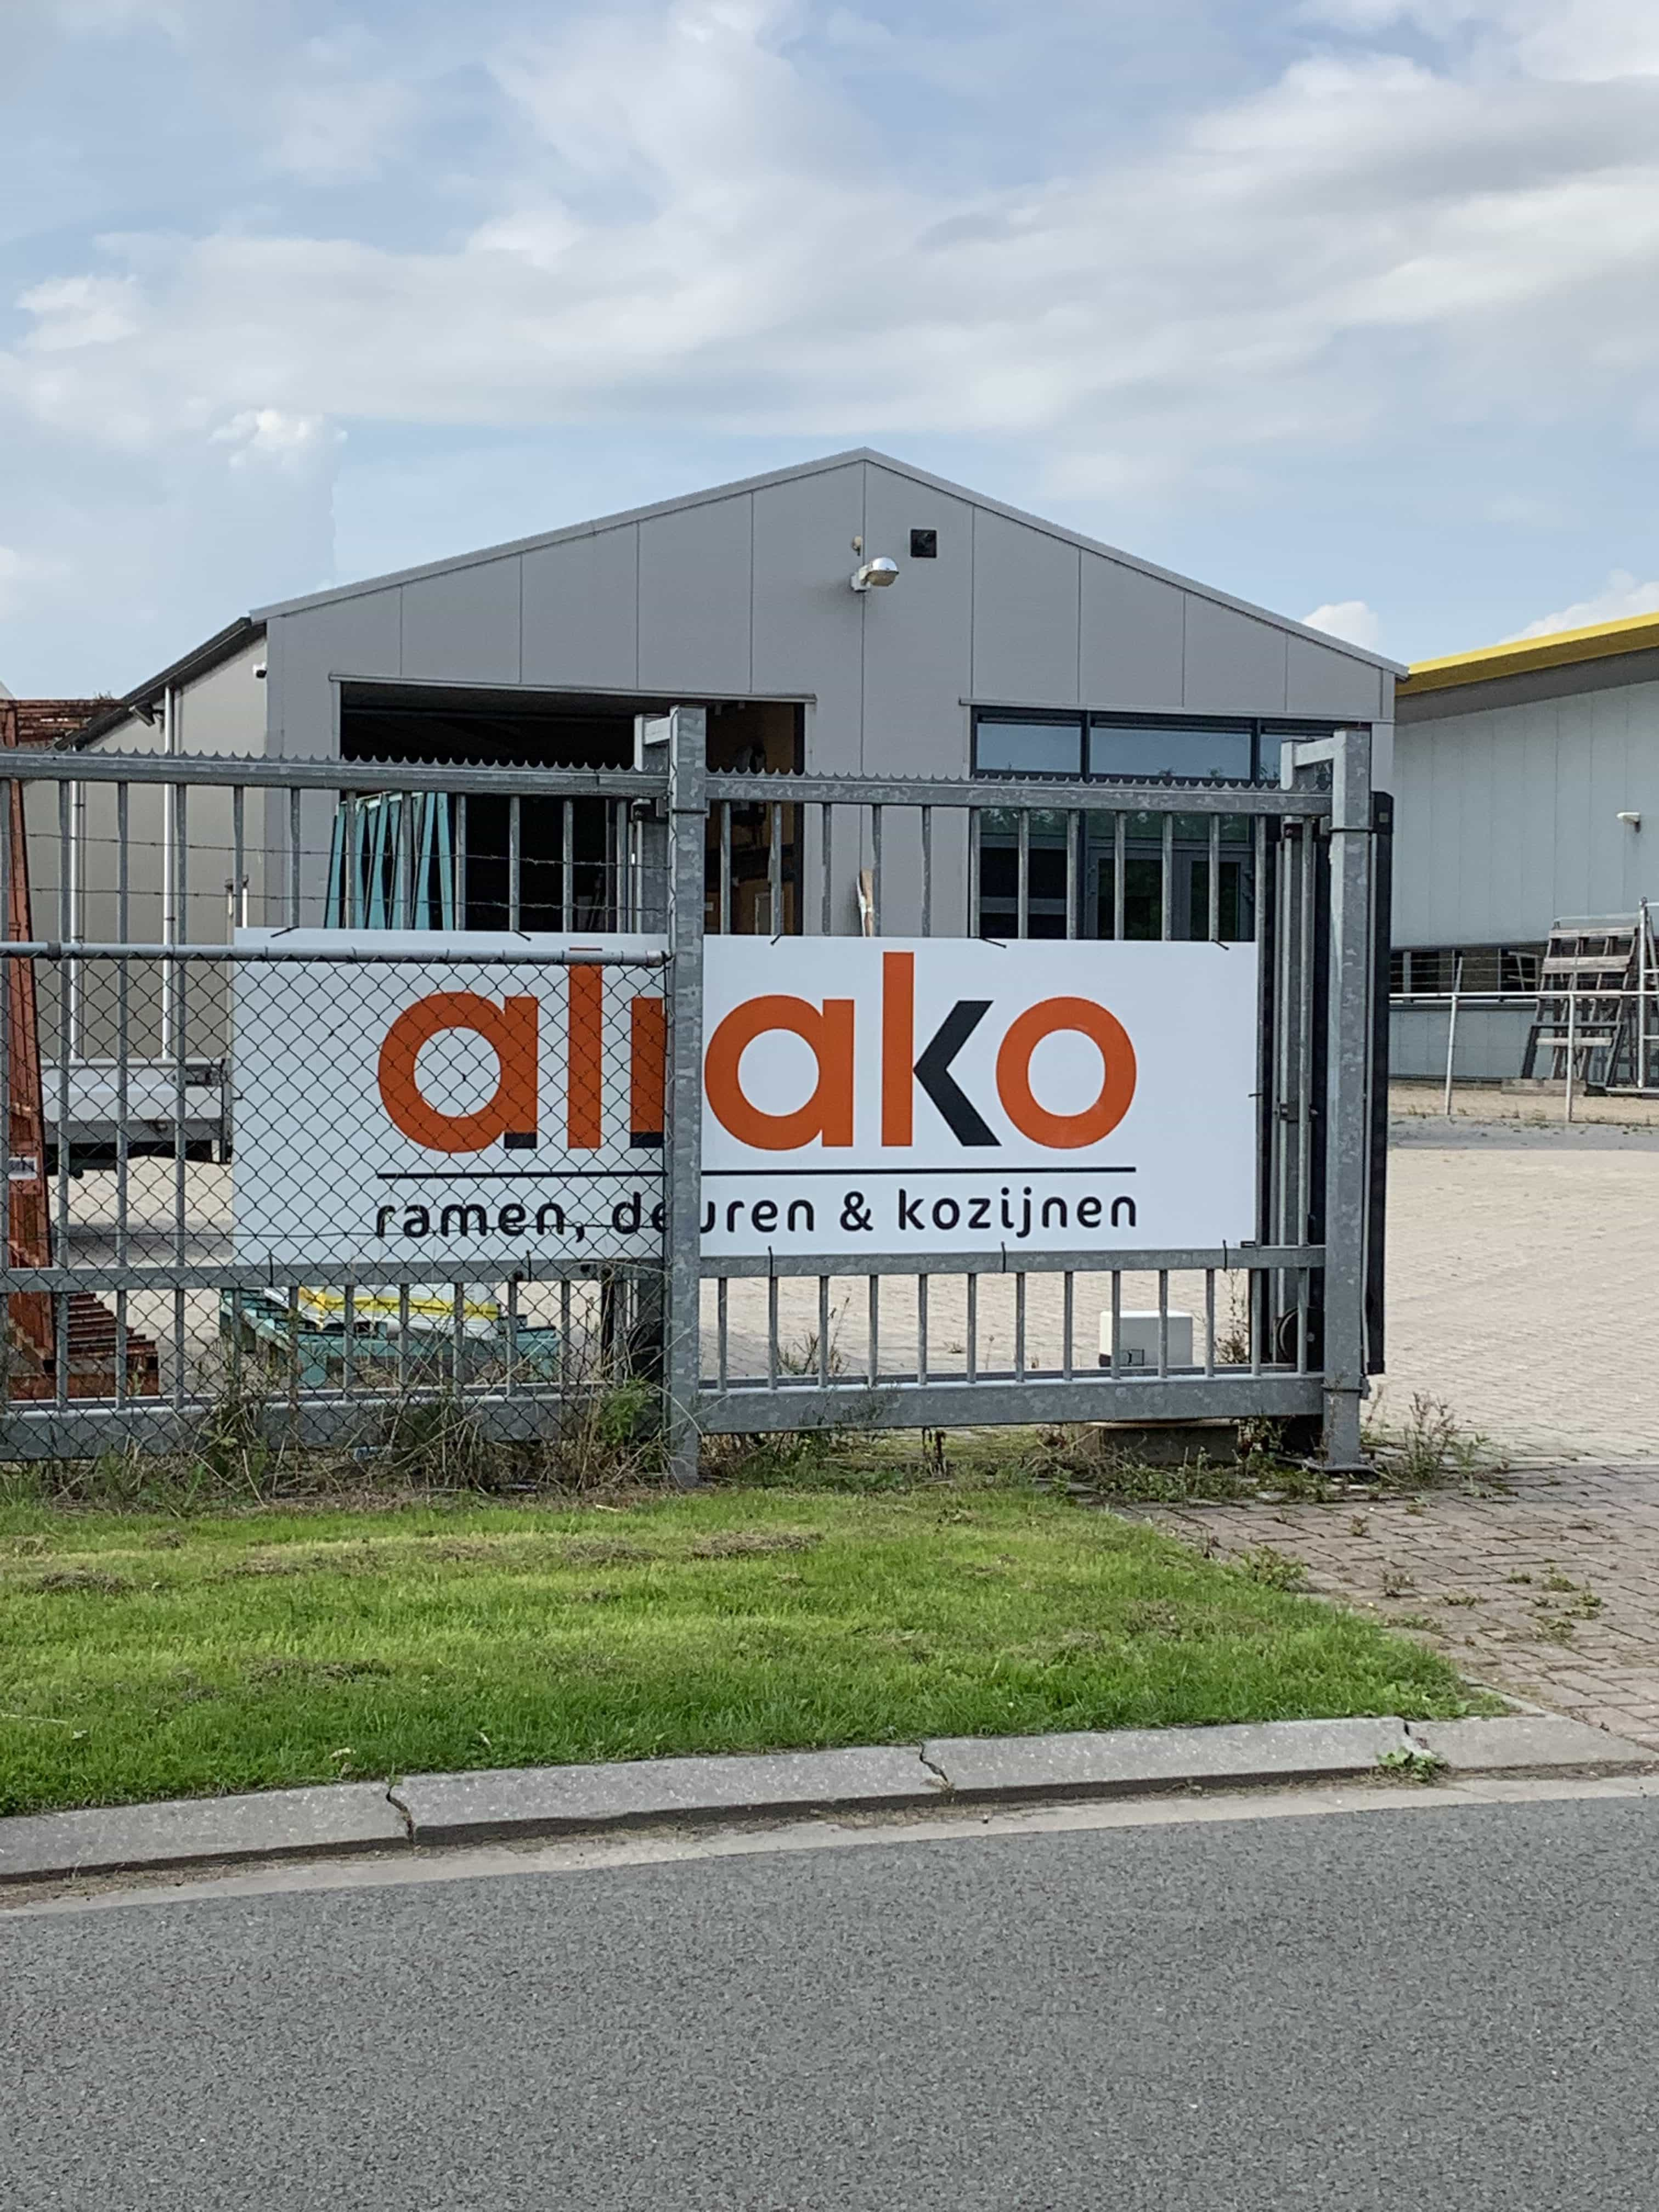 Bedrijfspand Alrako